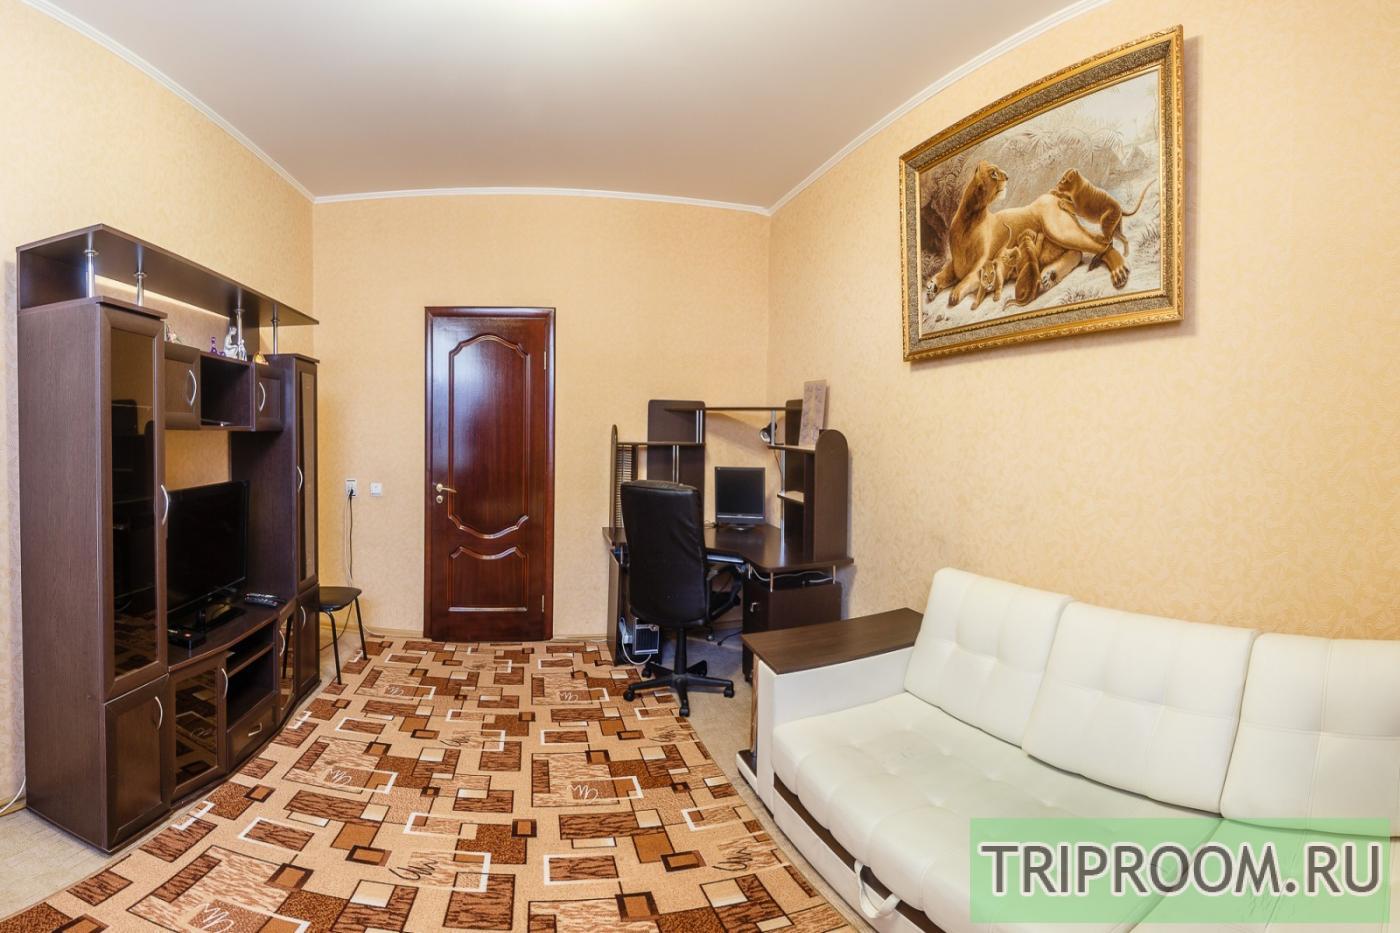 3-комнатная квартира посуточно (вариант № 15948), ул. Назарбаева улица, фото № 12